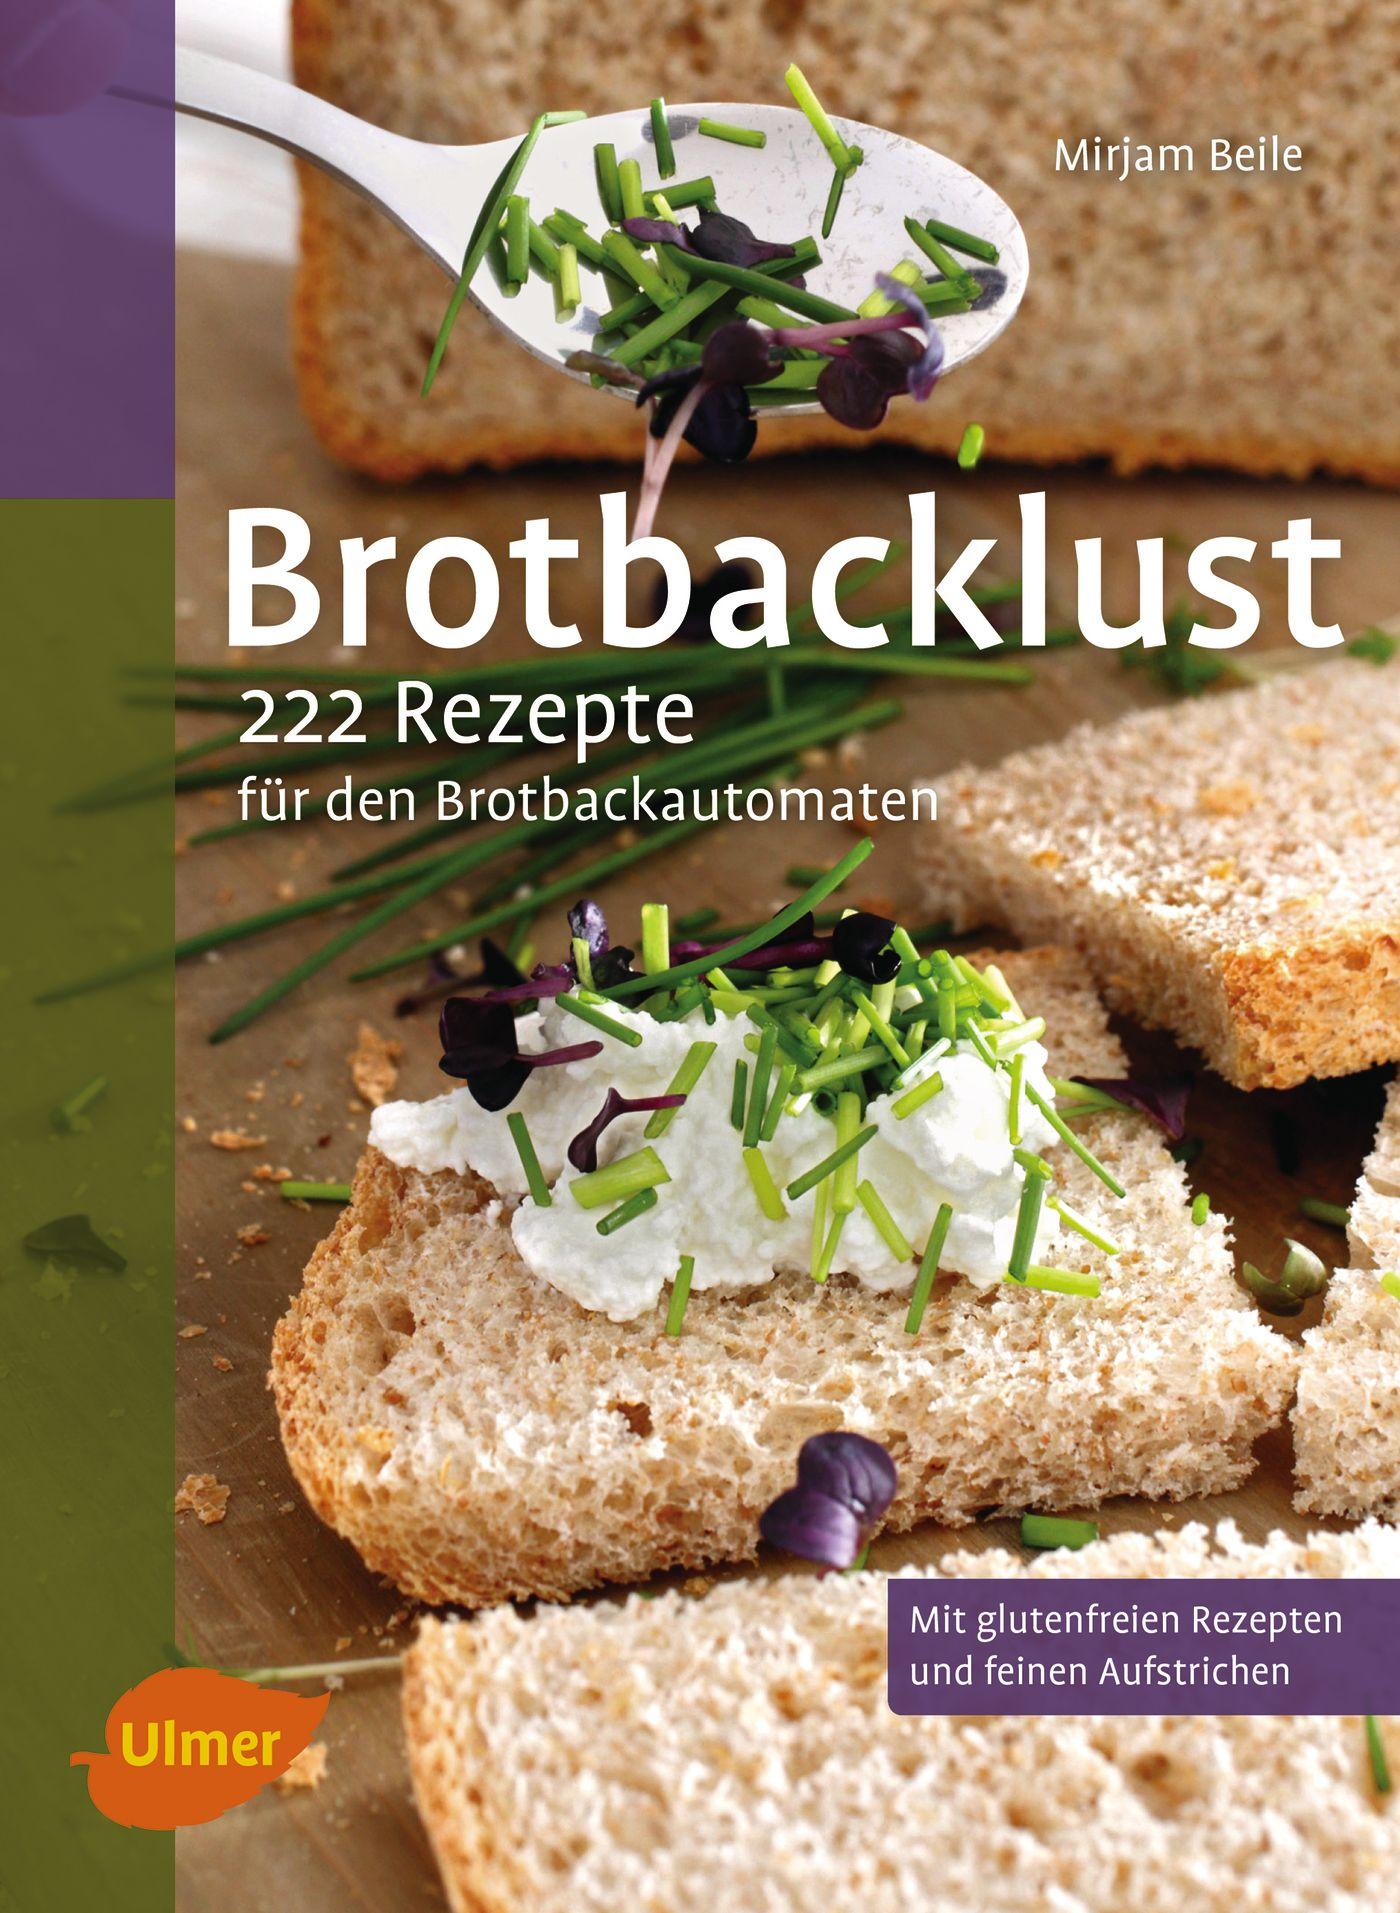 Brotbacklust-Mirjam-Beile